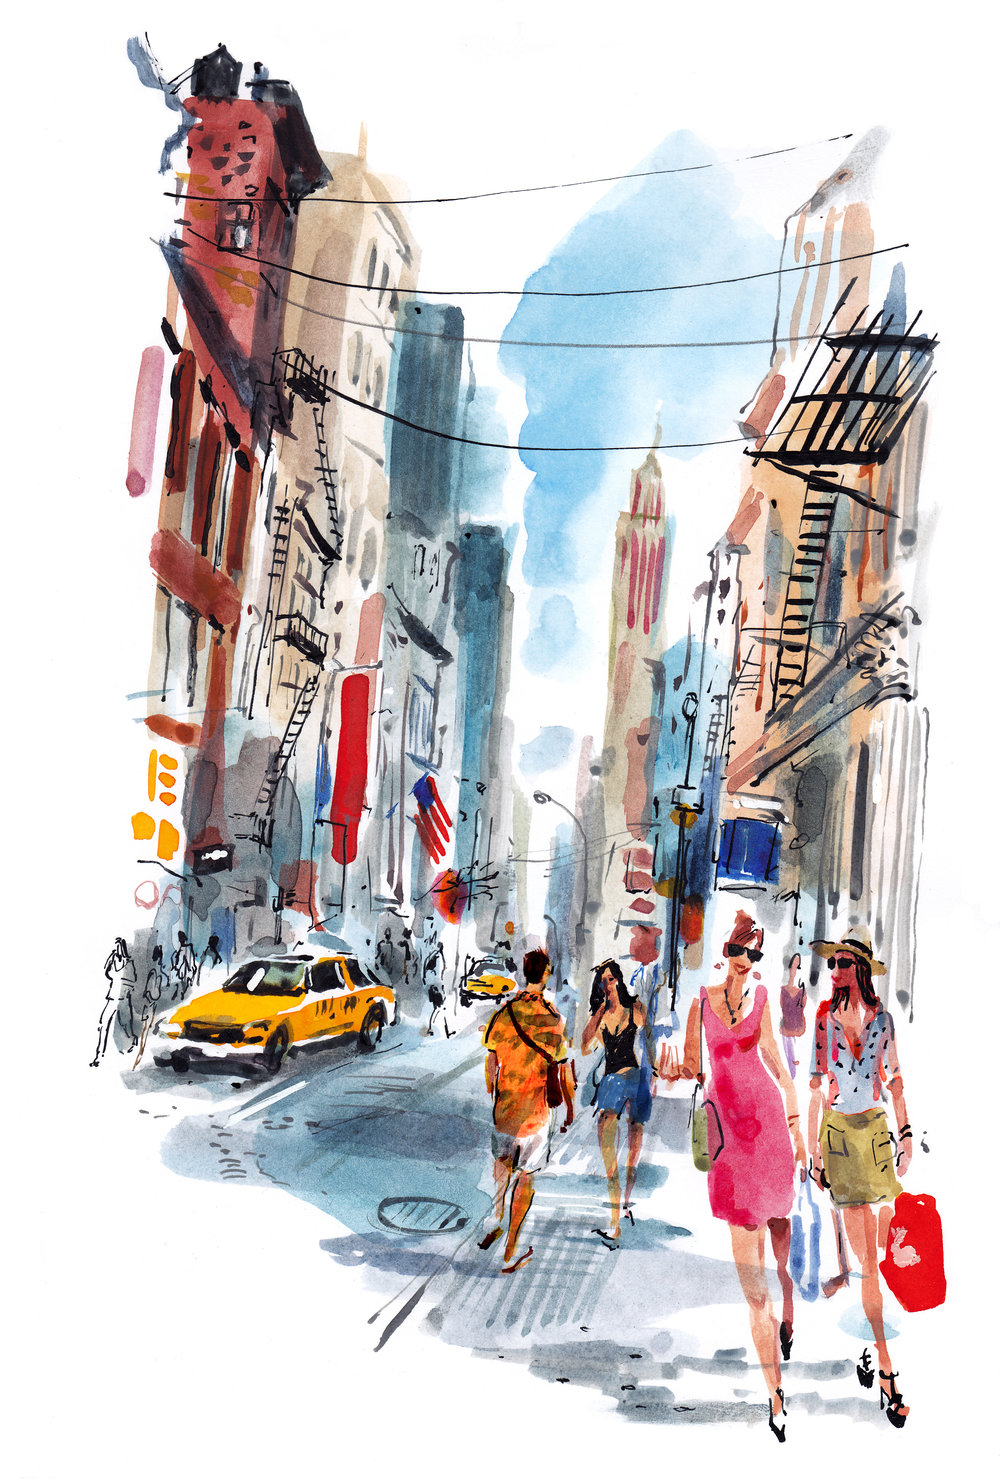 Soho shopping trip, New York